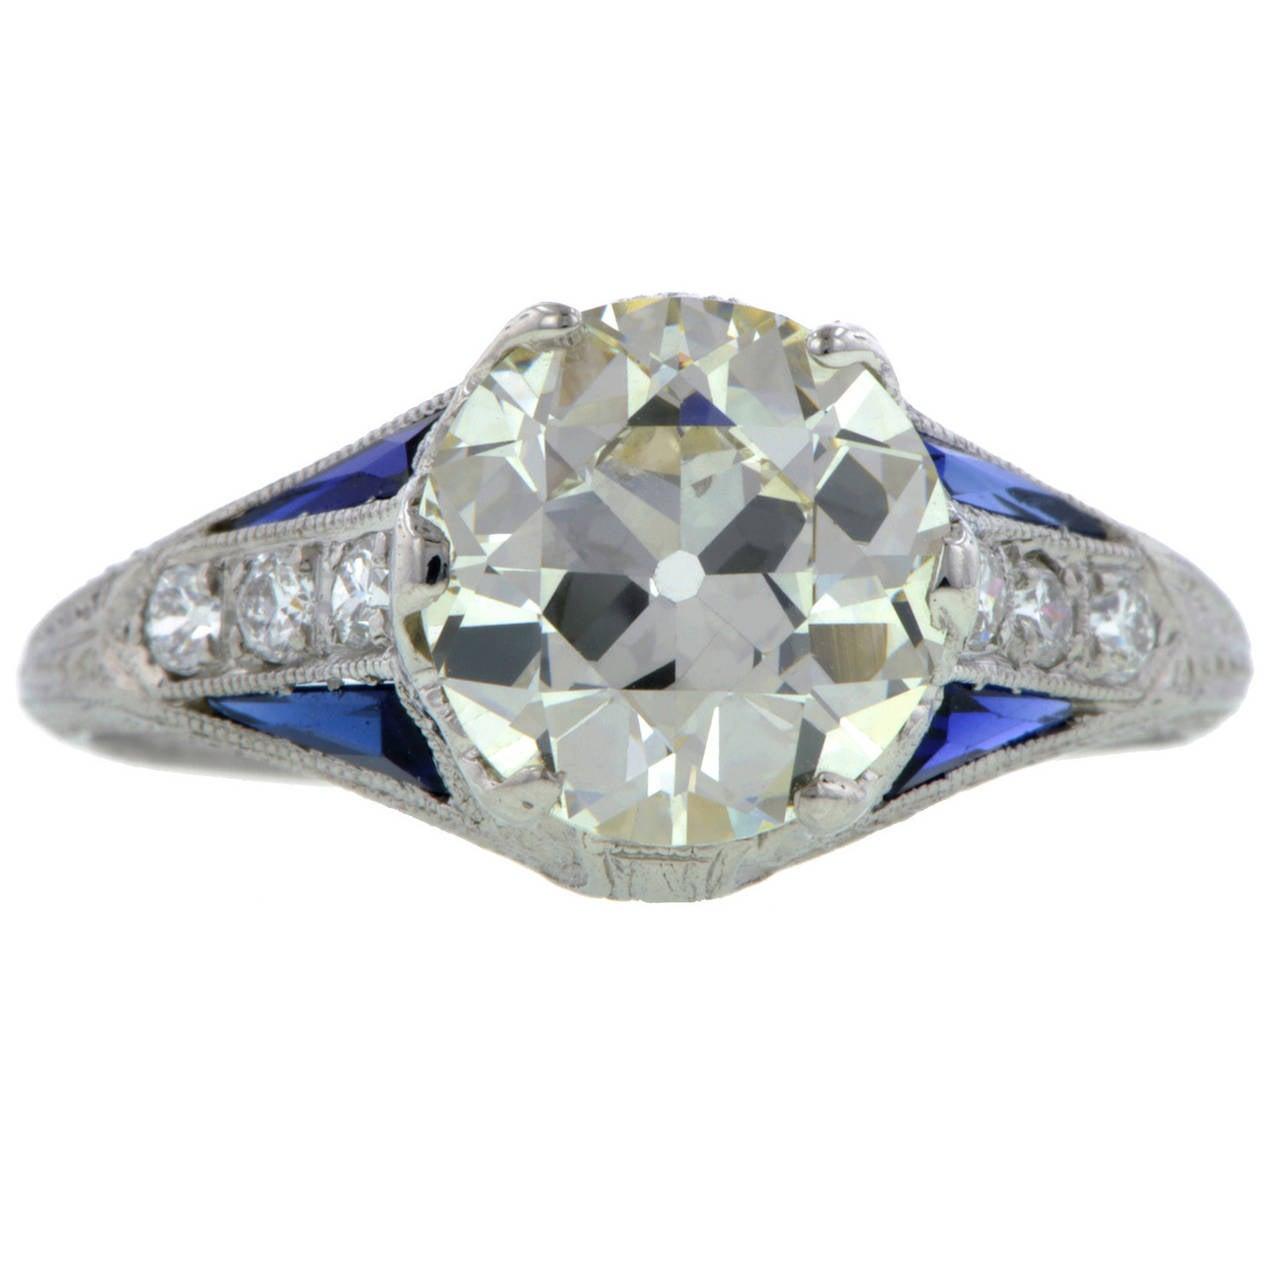 Art Deco 2 30 Carat Diamond Engagement Ring at 1stdibs